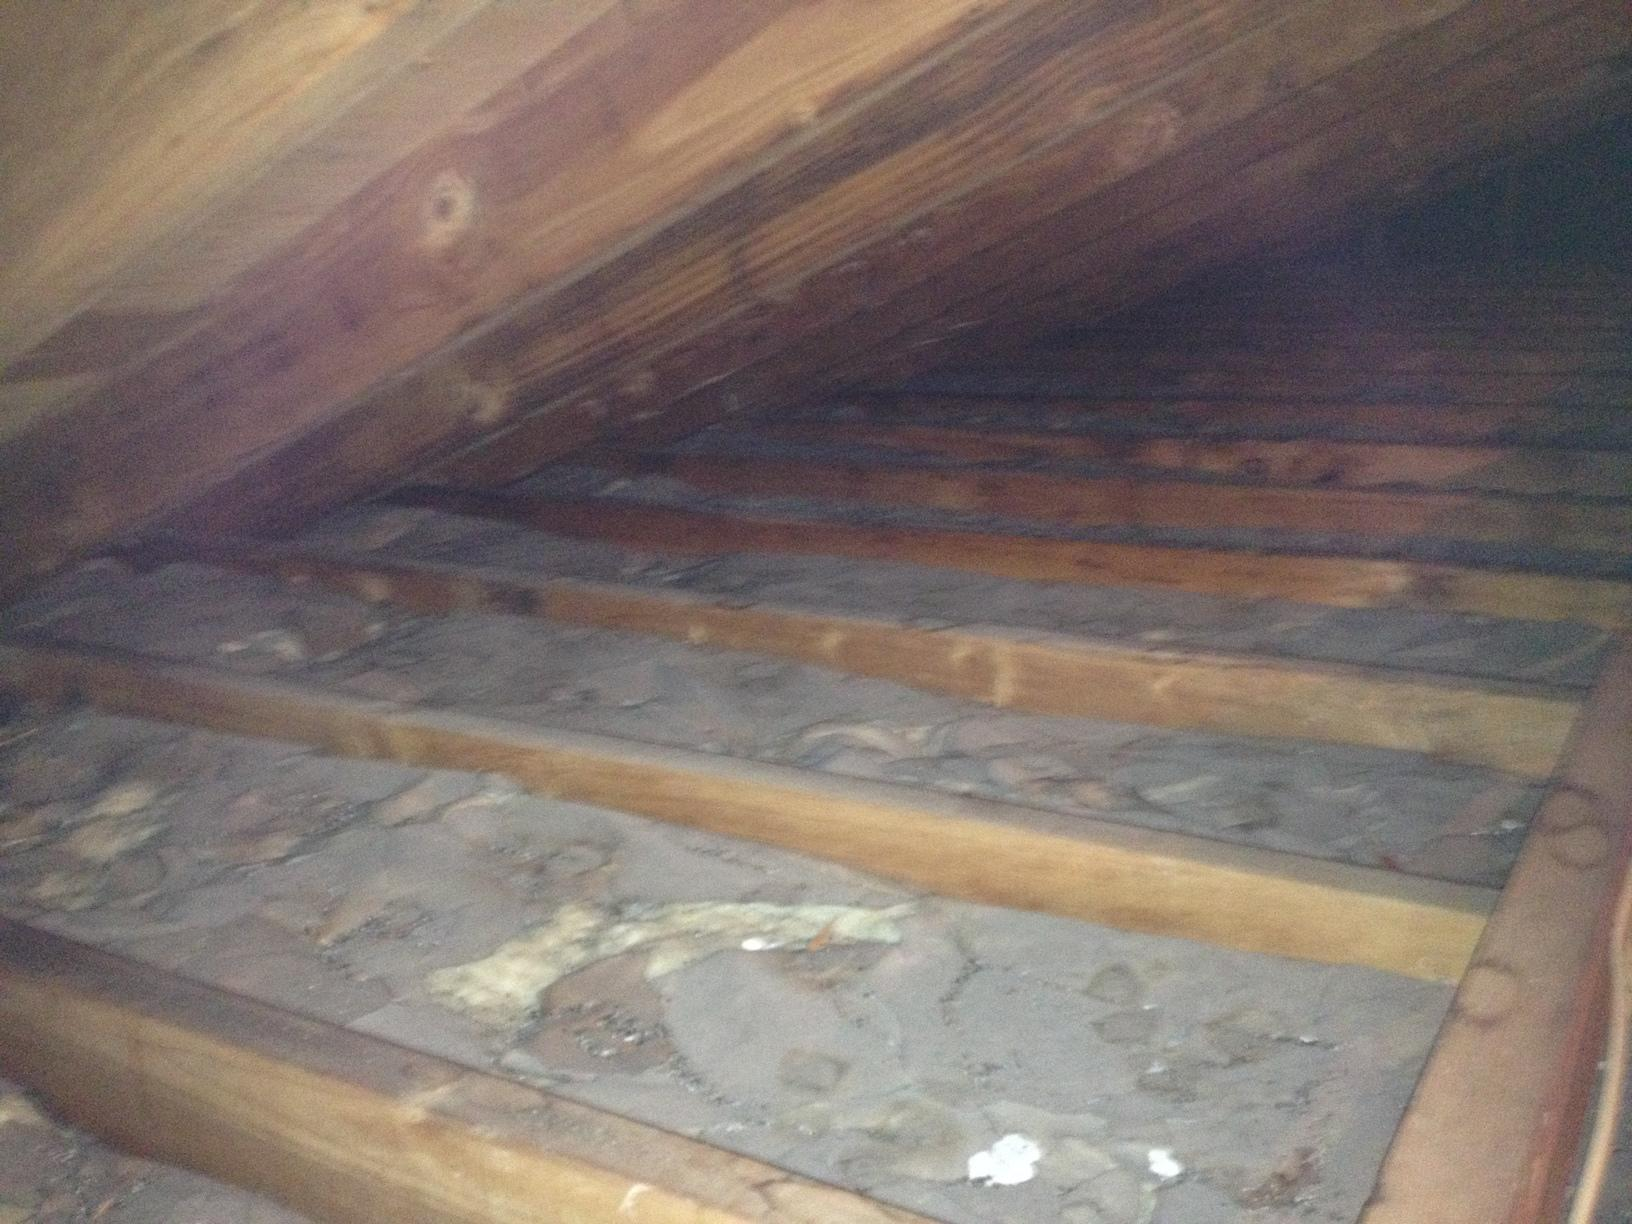 Attic insulation in Neptune, NJ - Before Photo